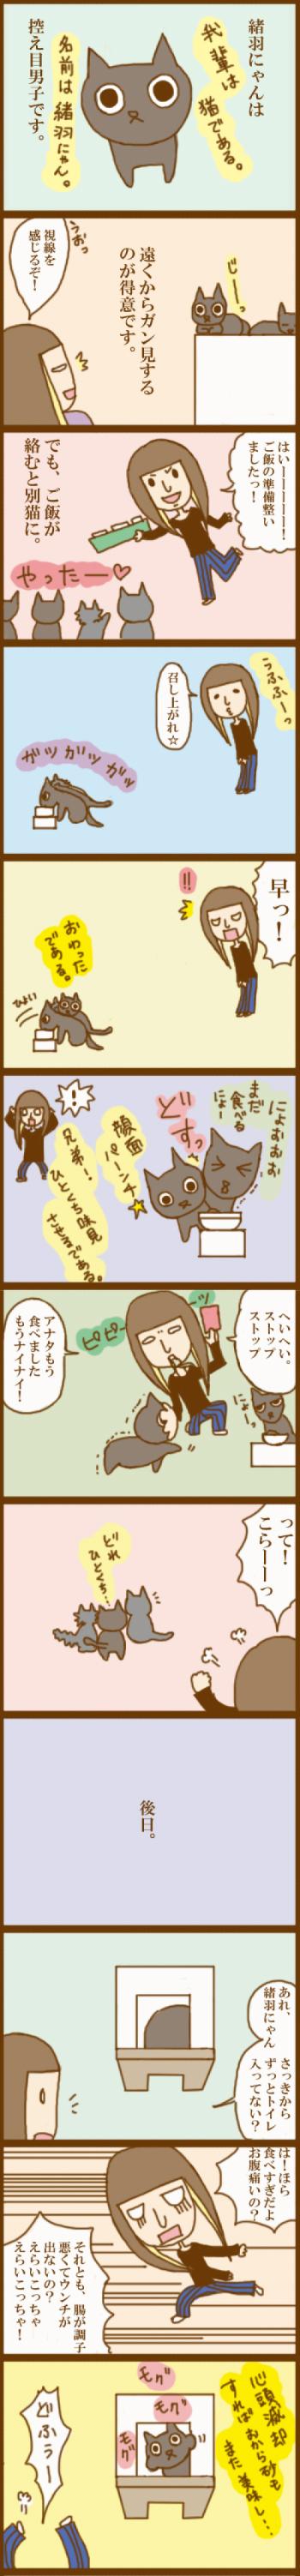 f:id:suzuokayu:20201105085950j:plain